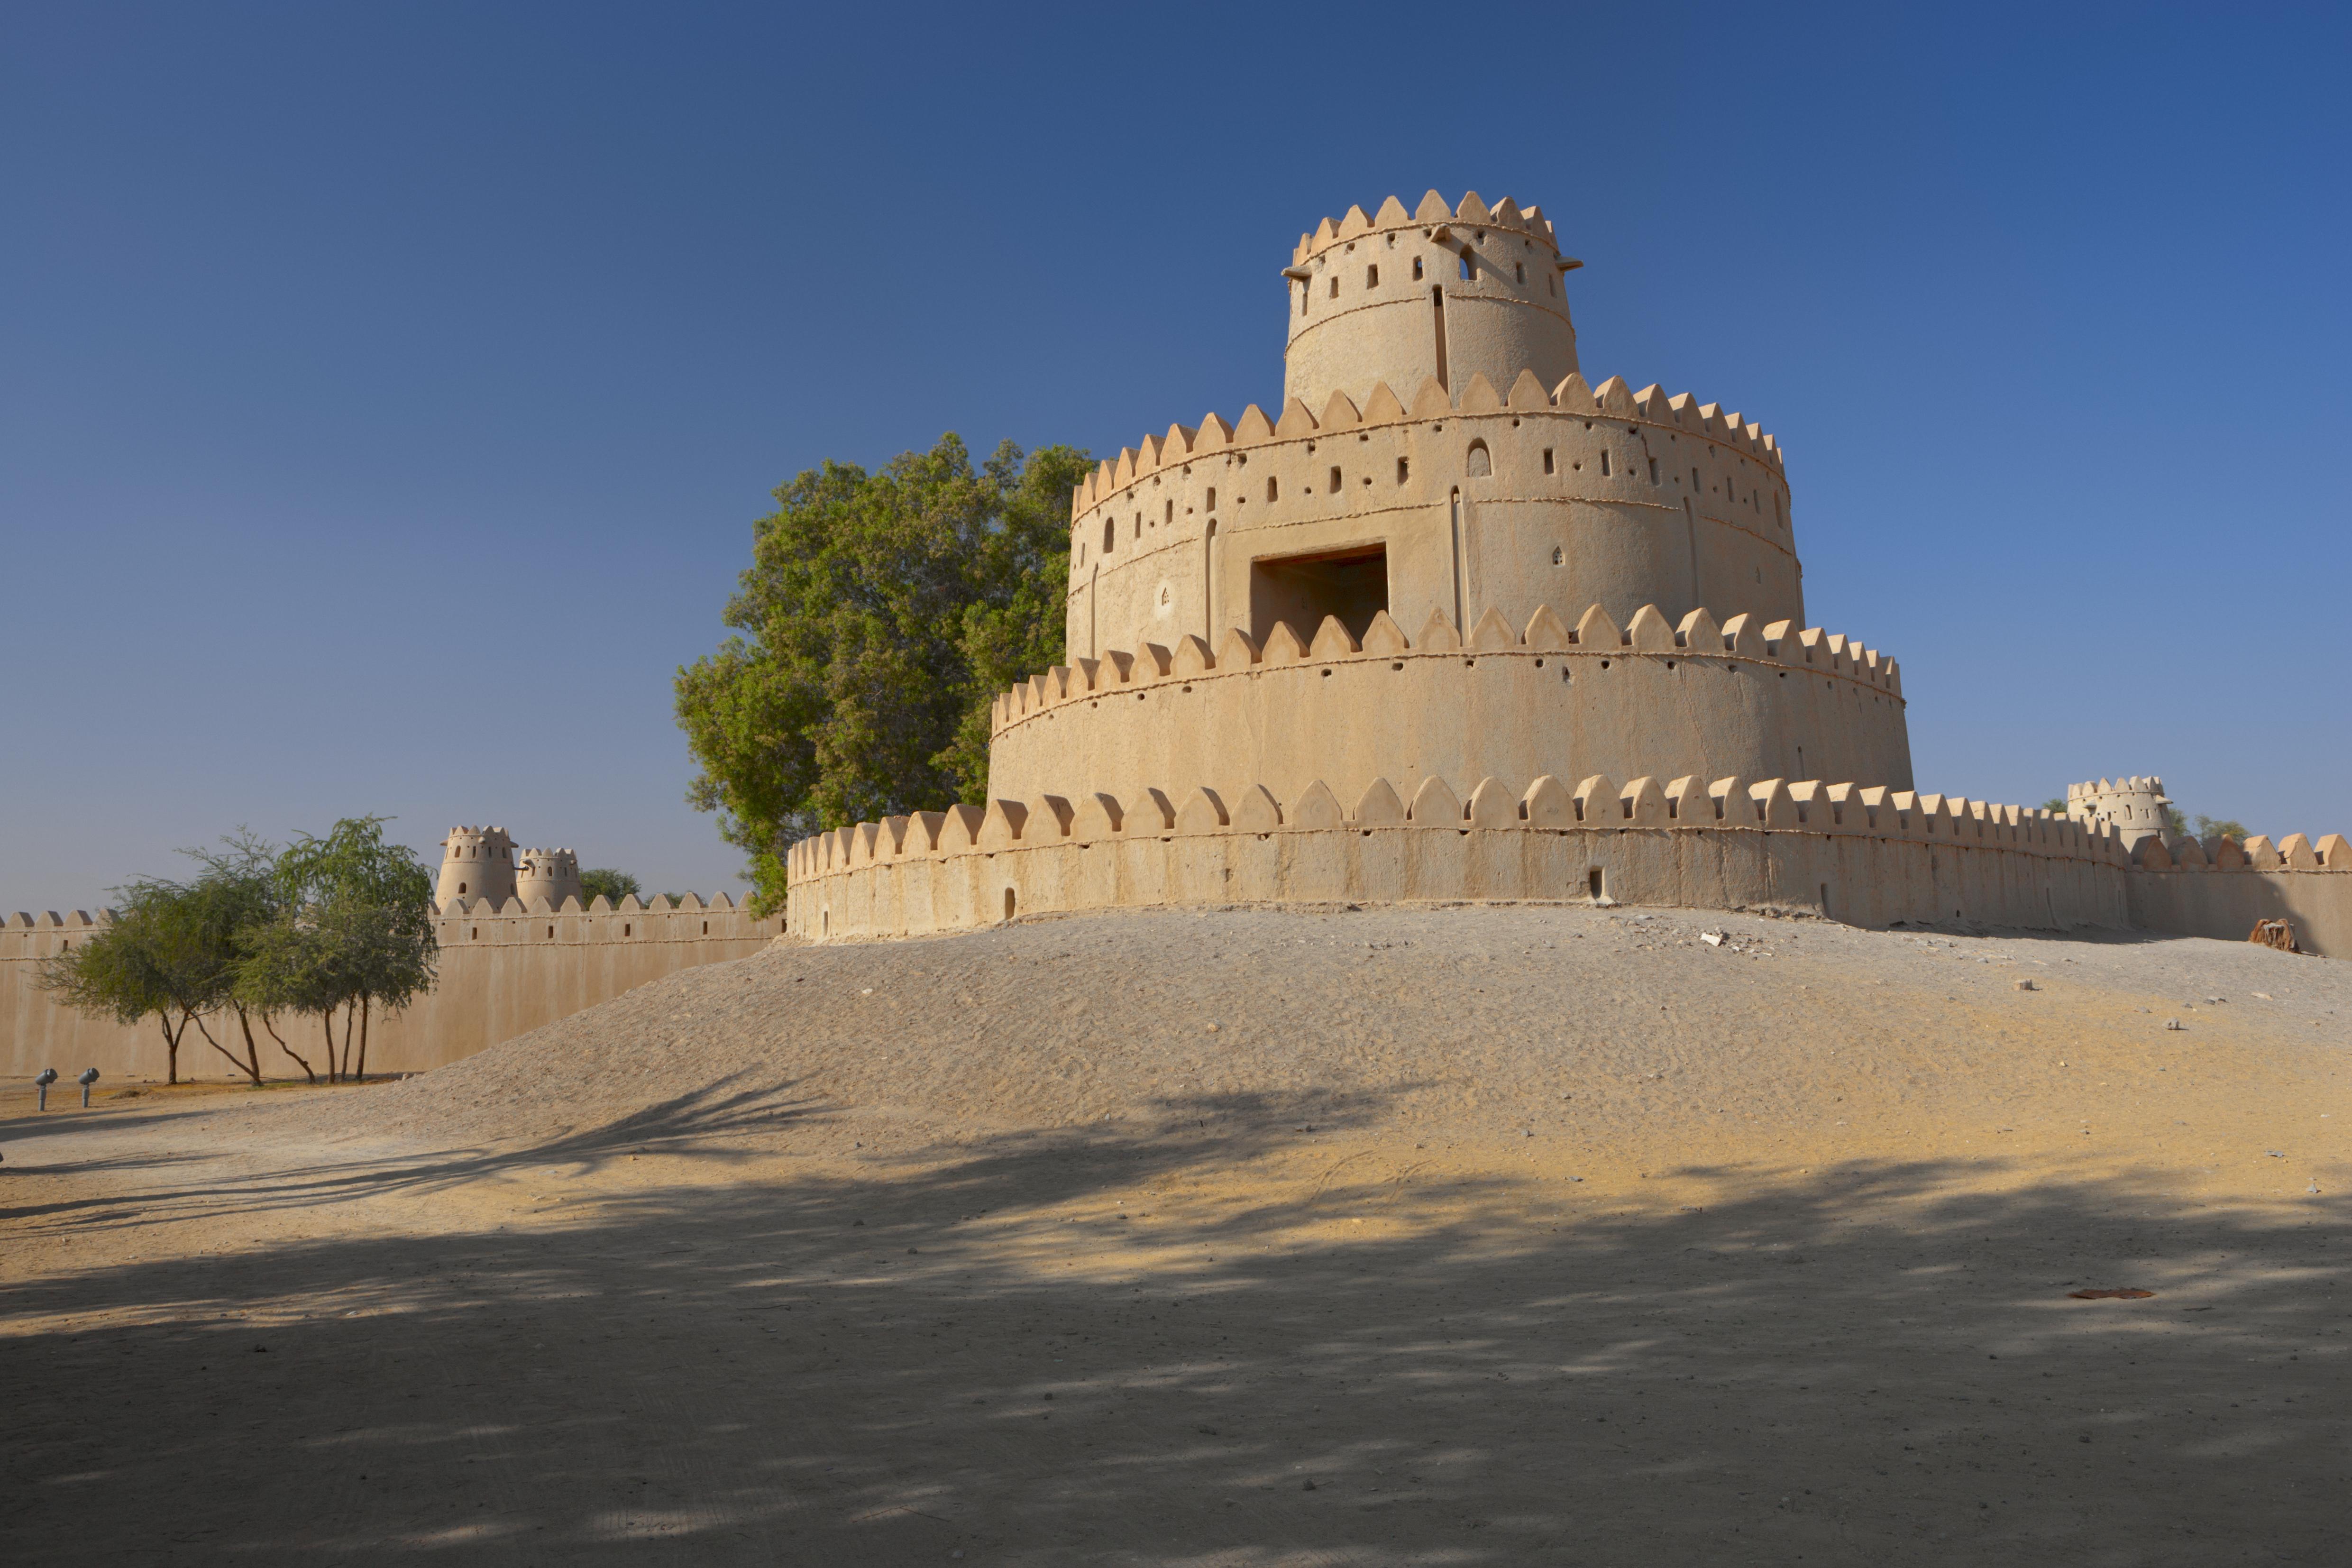 Al Jahil Fort, photo courtesy of Abu Dhabi Dept of Culture & Tourism